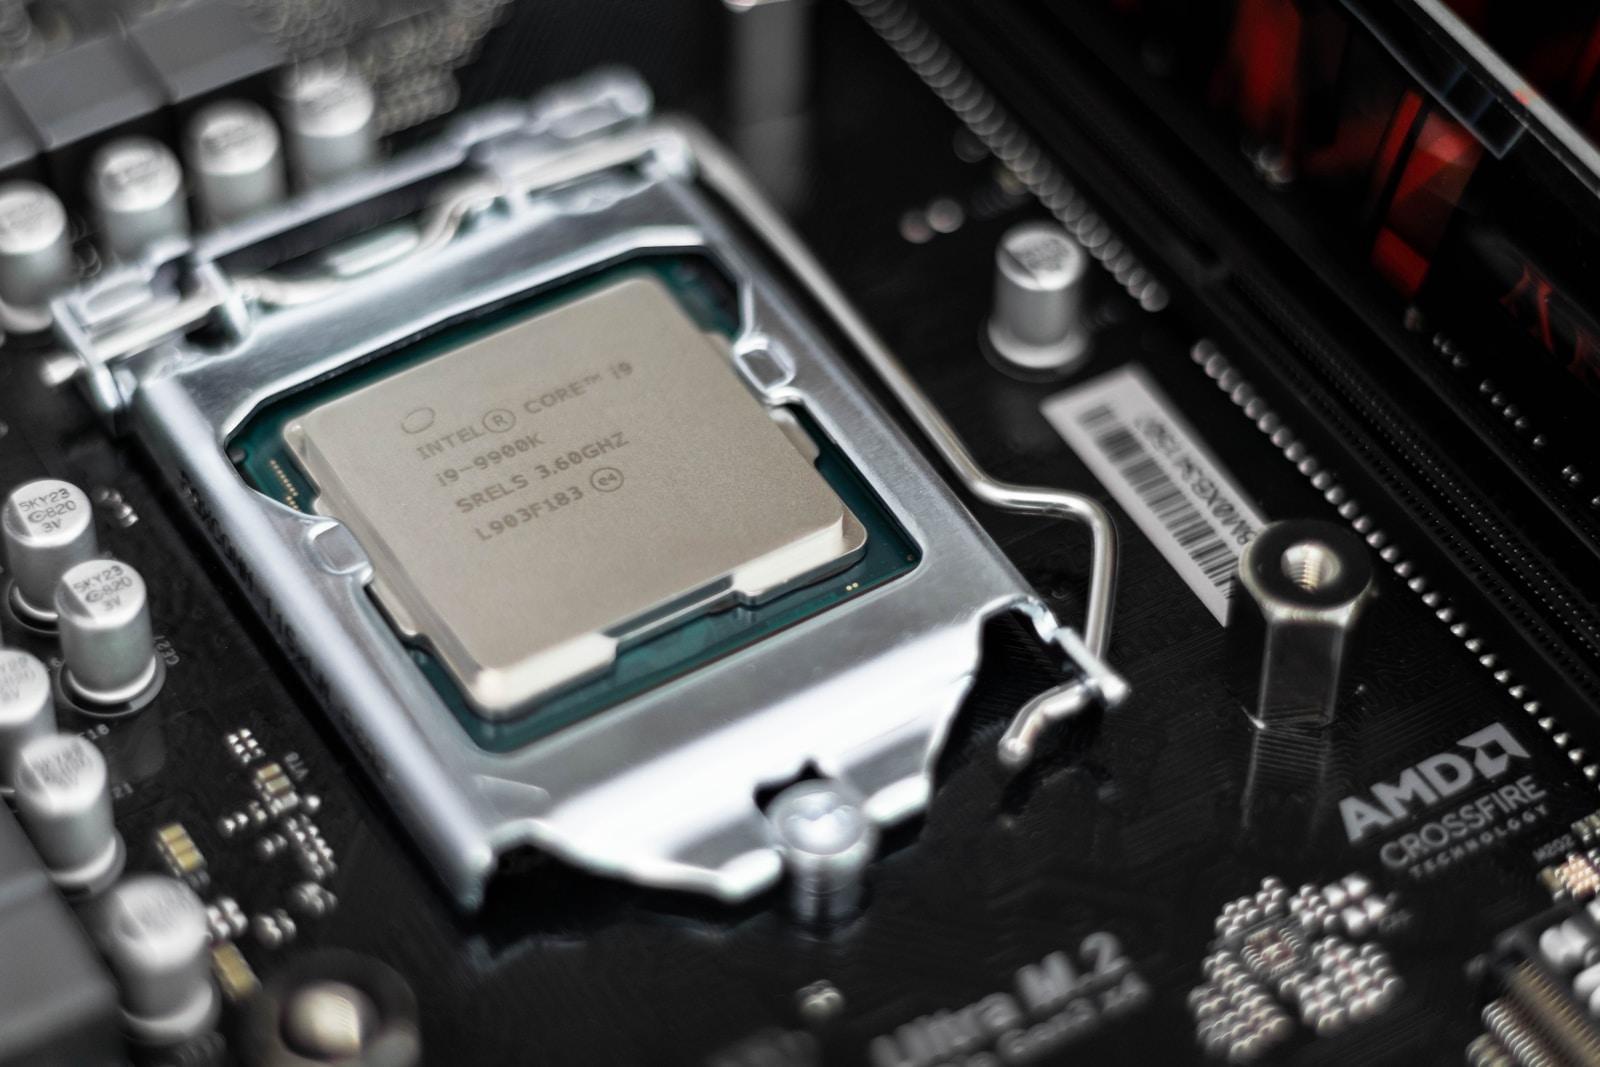 Intel Prozessor processor on black motherboard core i9 9900k